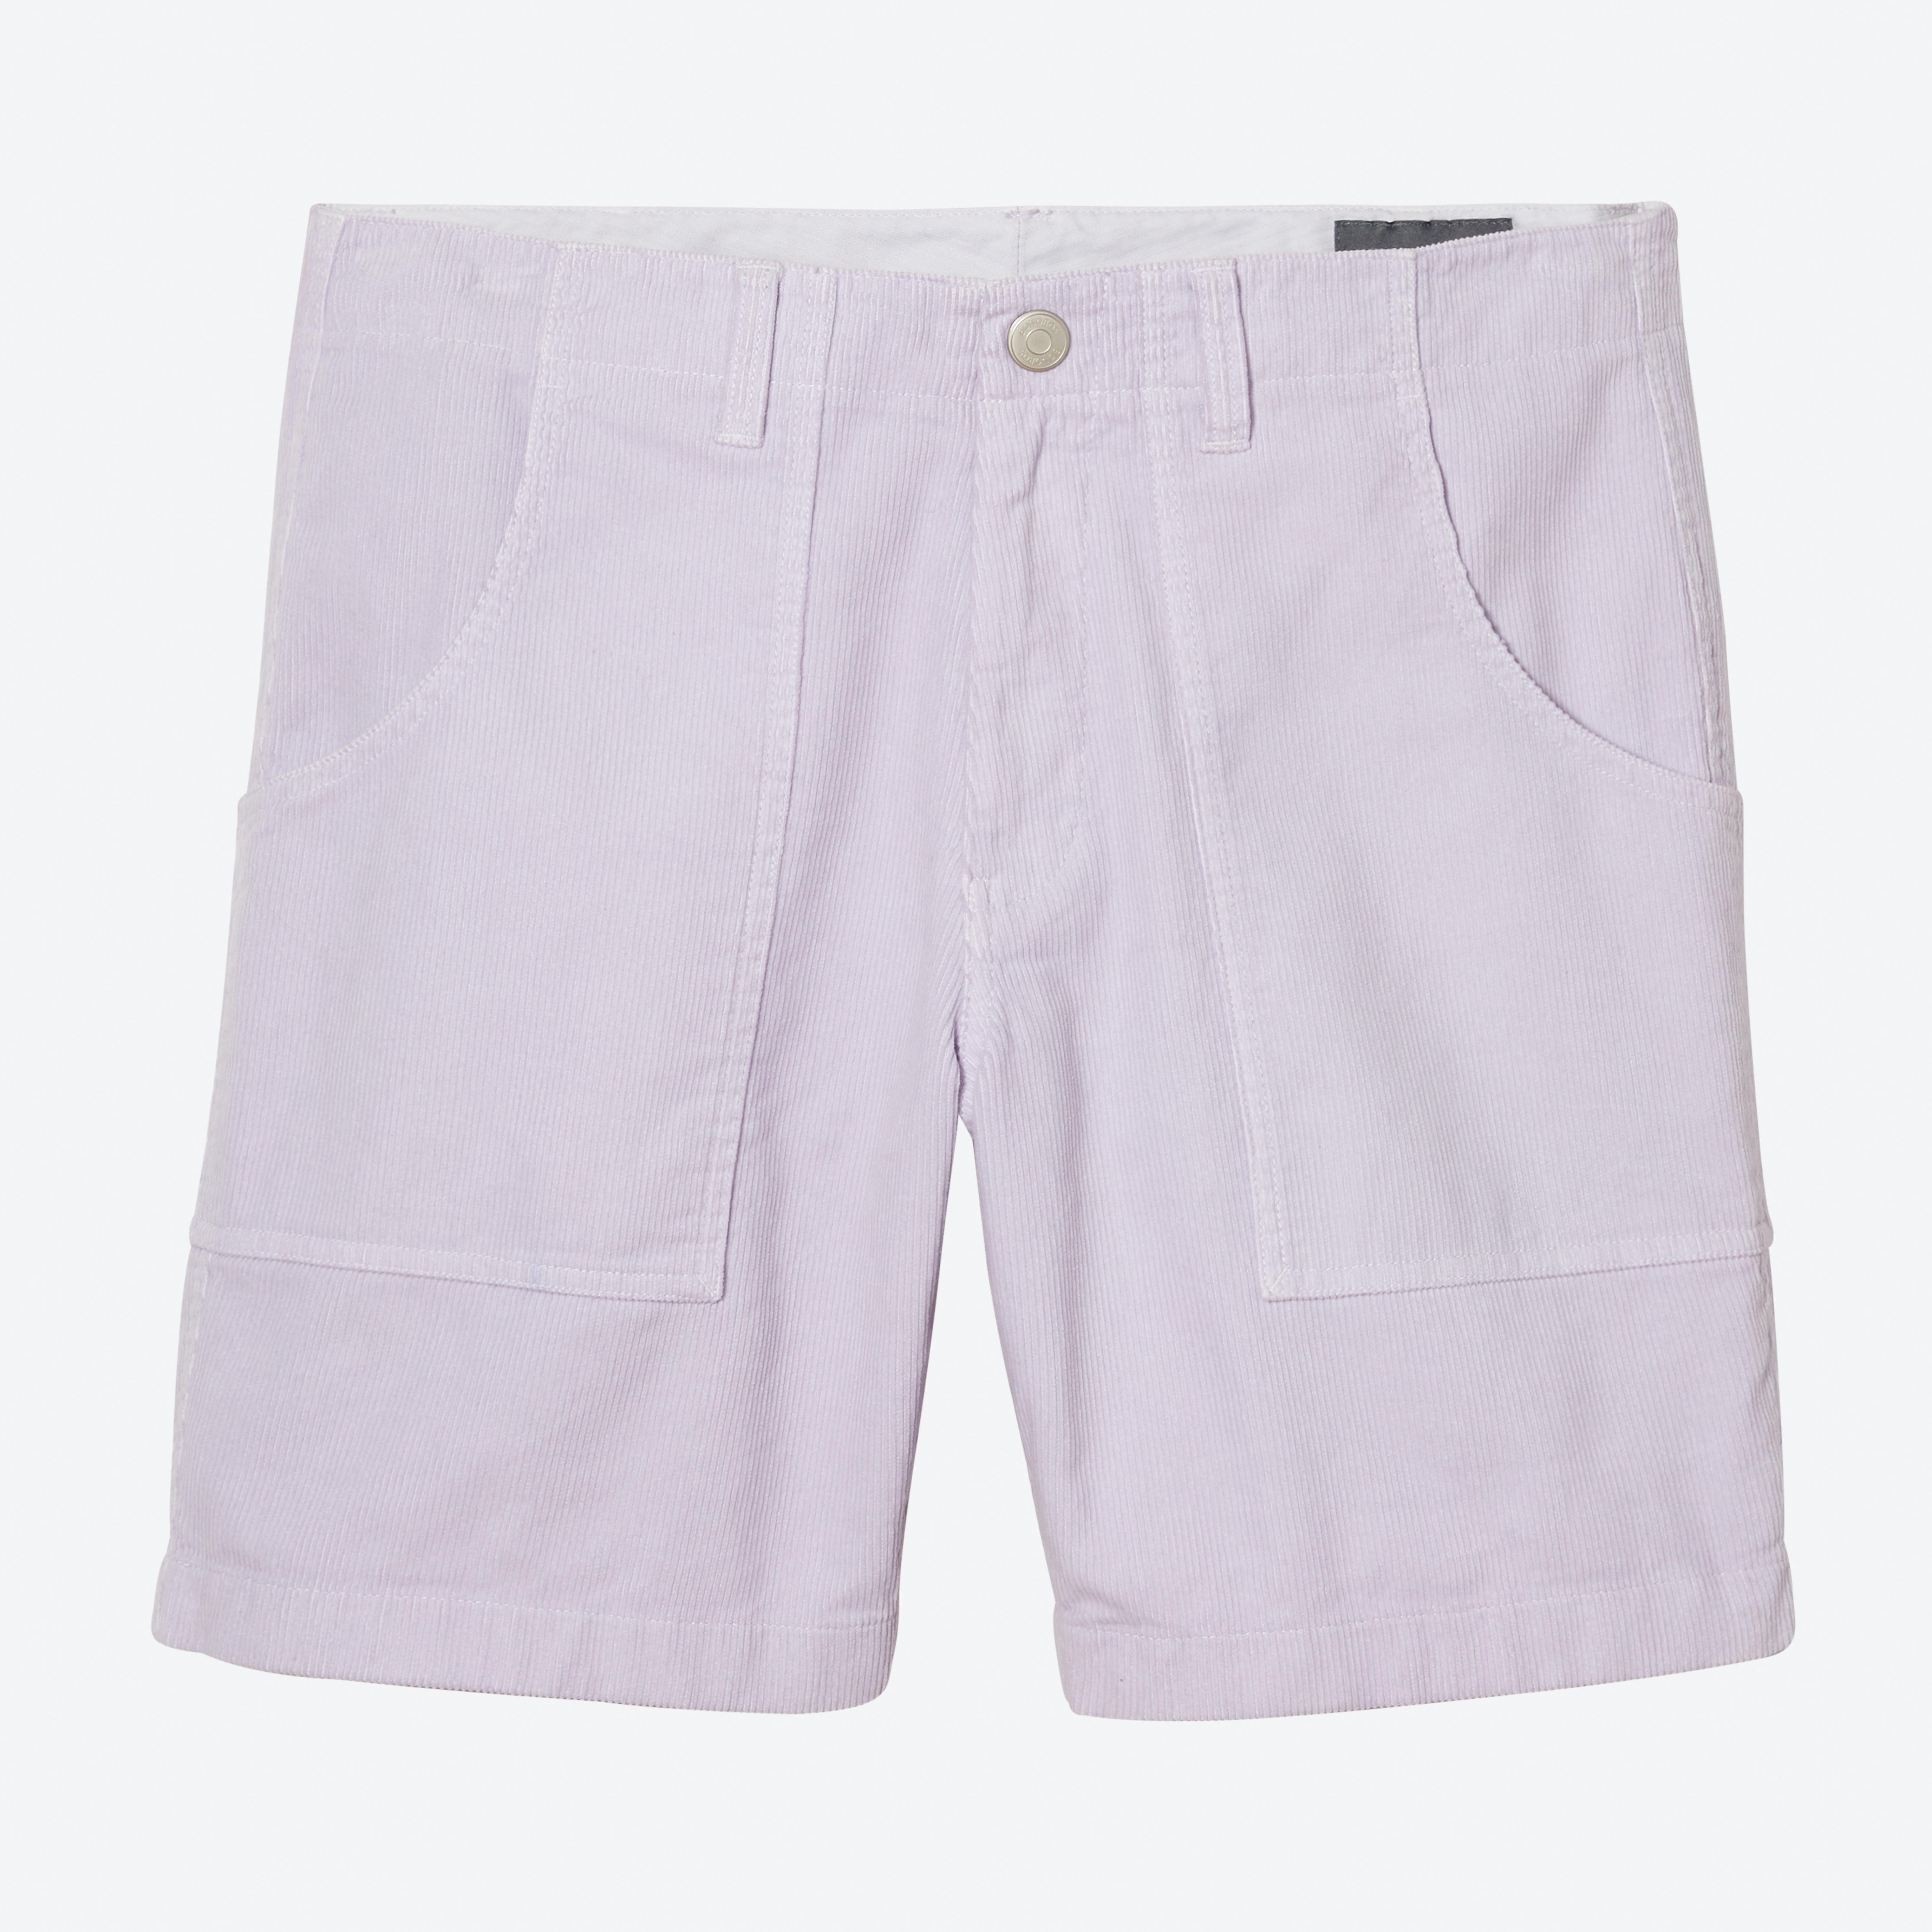 Fatigue Cord Shorts